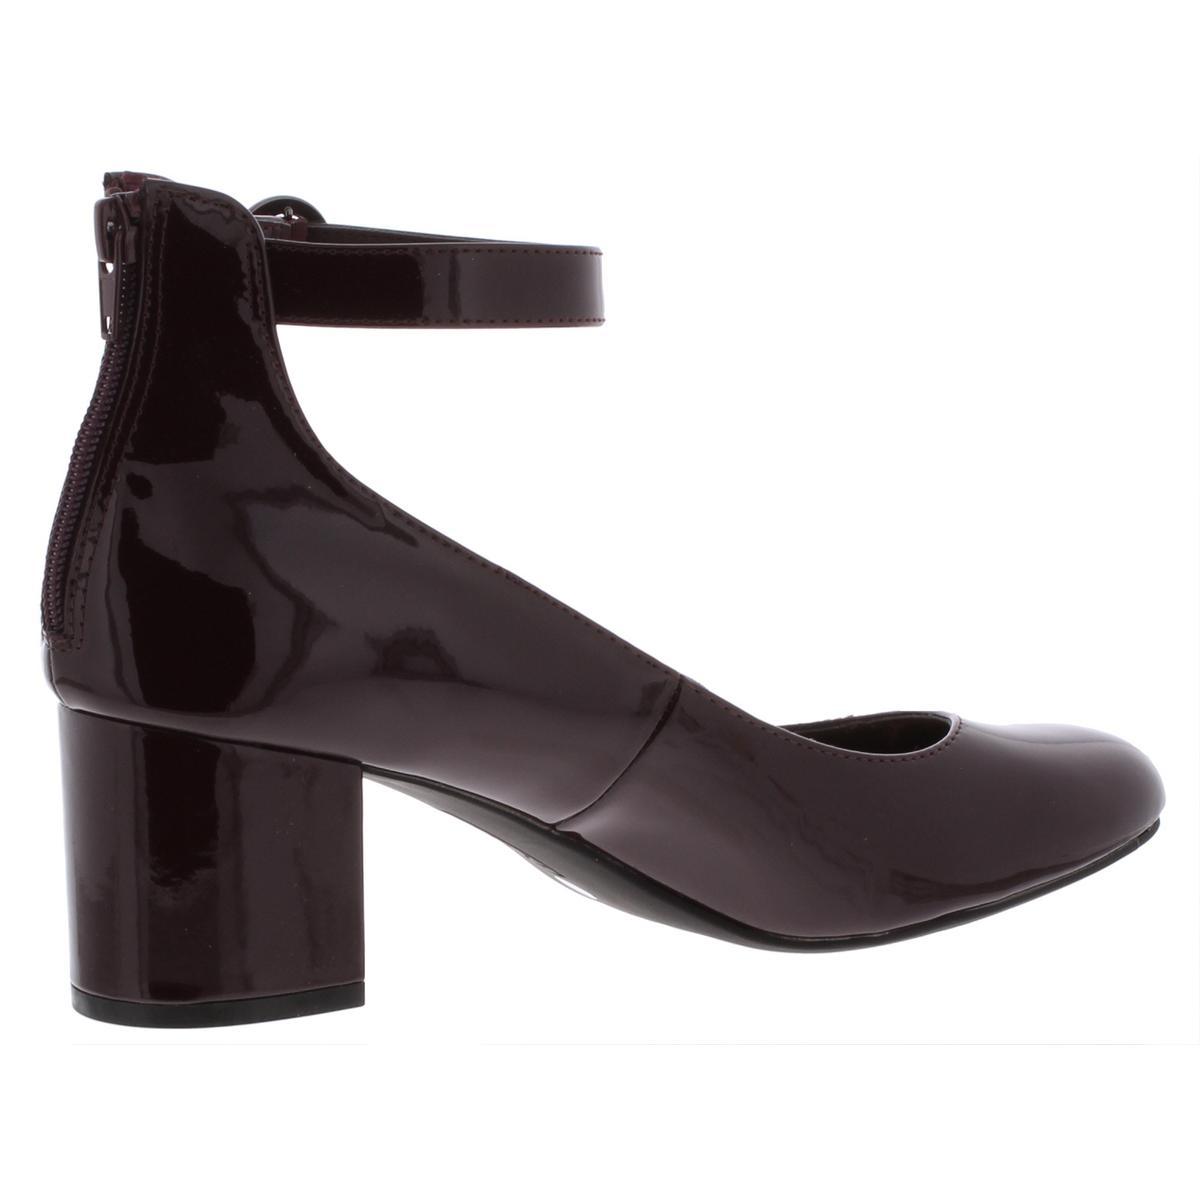 Alfani-Femme-ashiaa-Cheville-Sangle-Escarpins-Chaussures-BHFO-5590 miniature 9